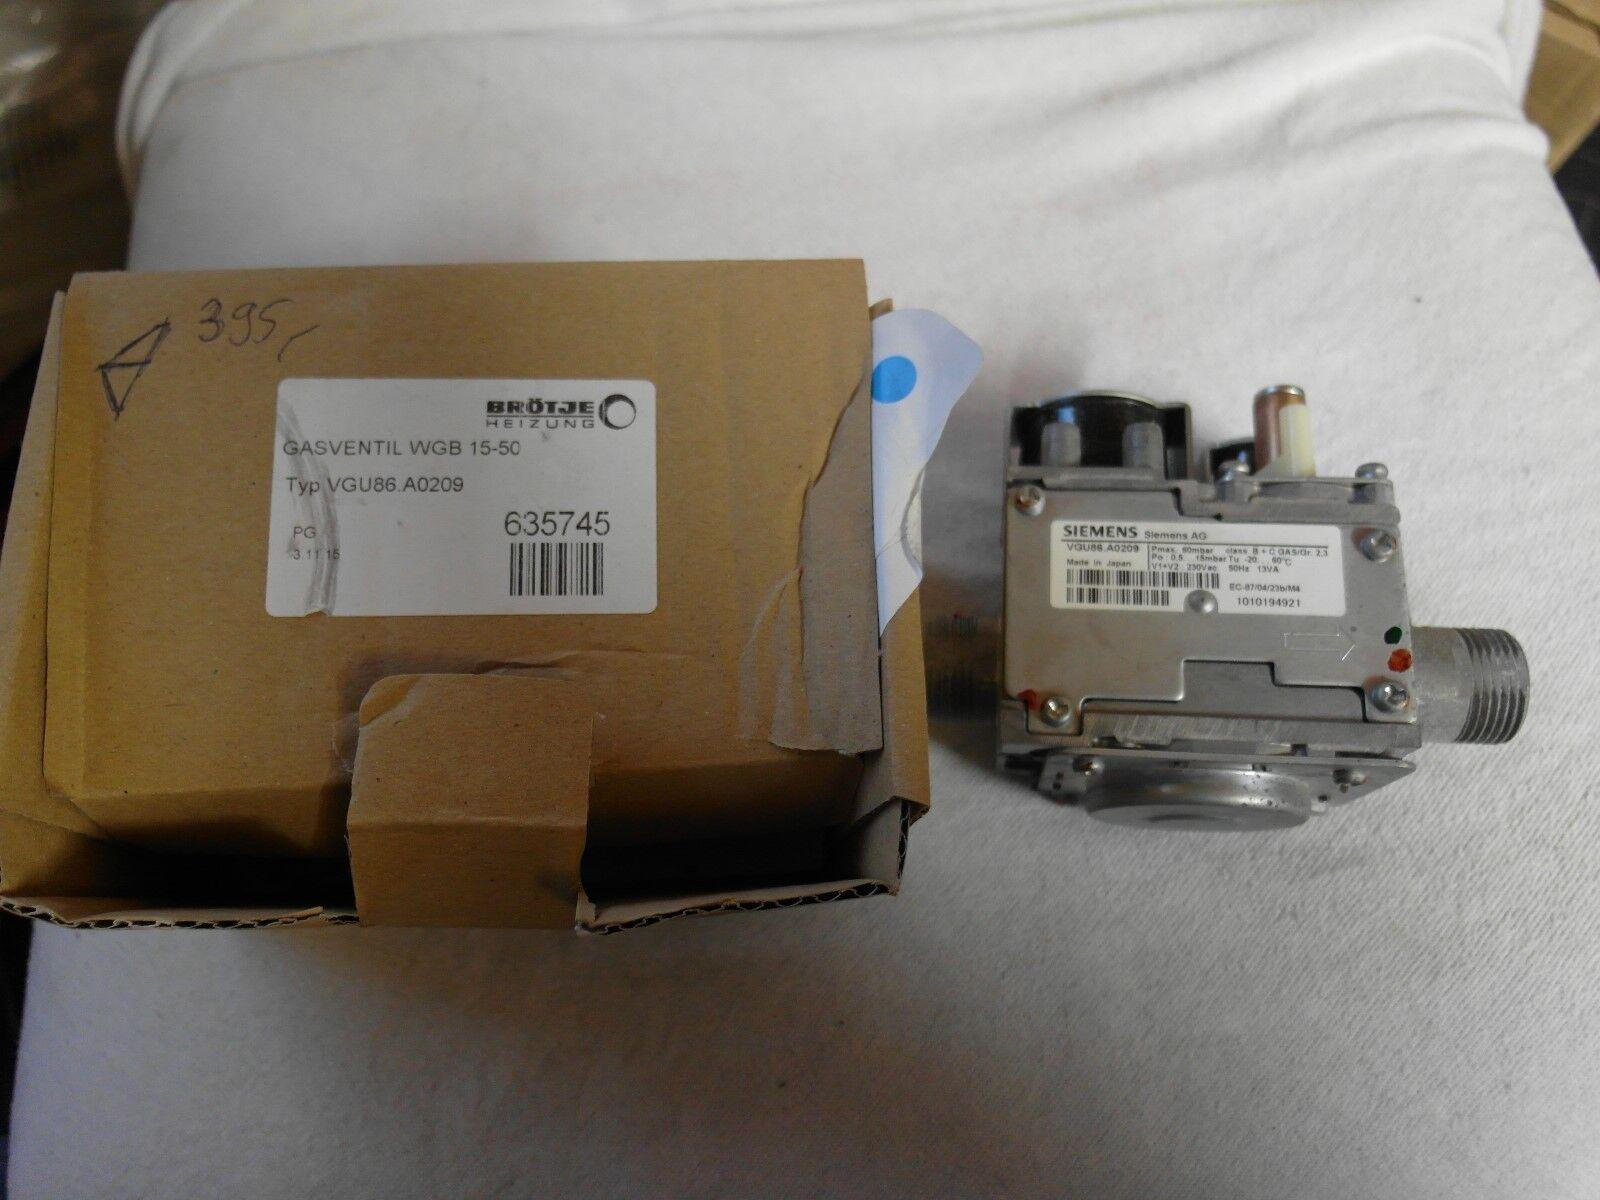 Brötje Heizung Gasventil WGB15-50 TYP VGU86.A0209 ( Siemens VGU86.A0209 )